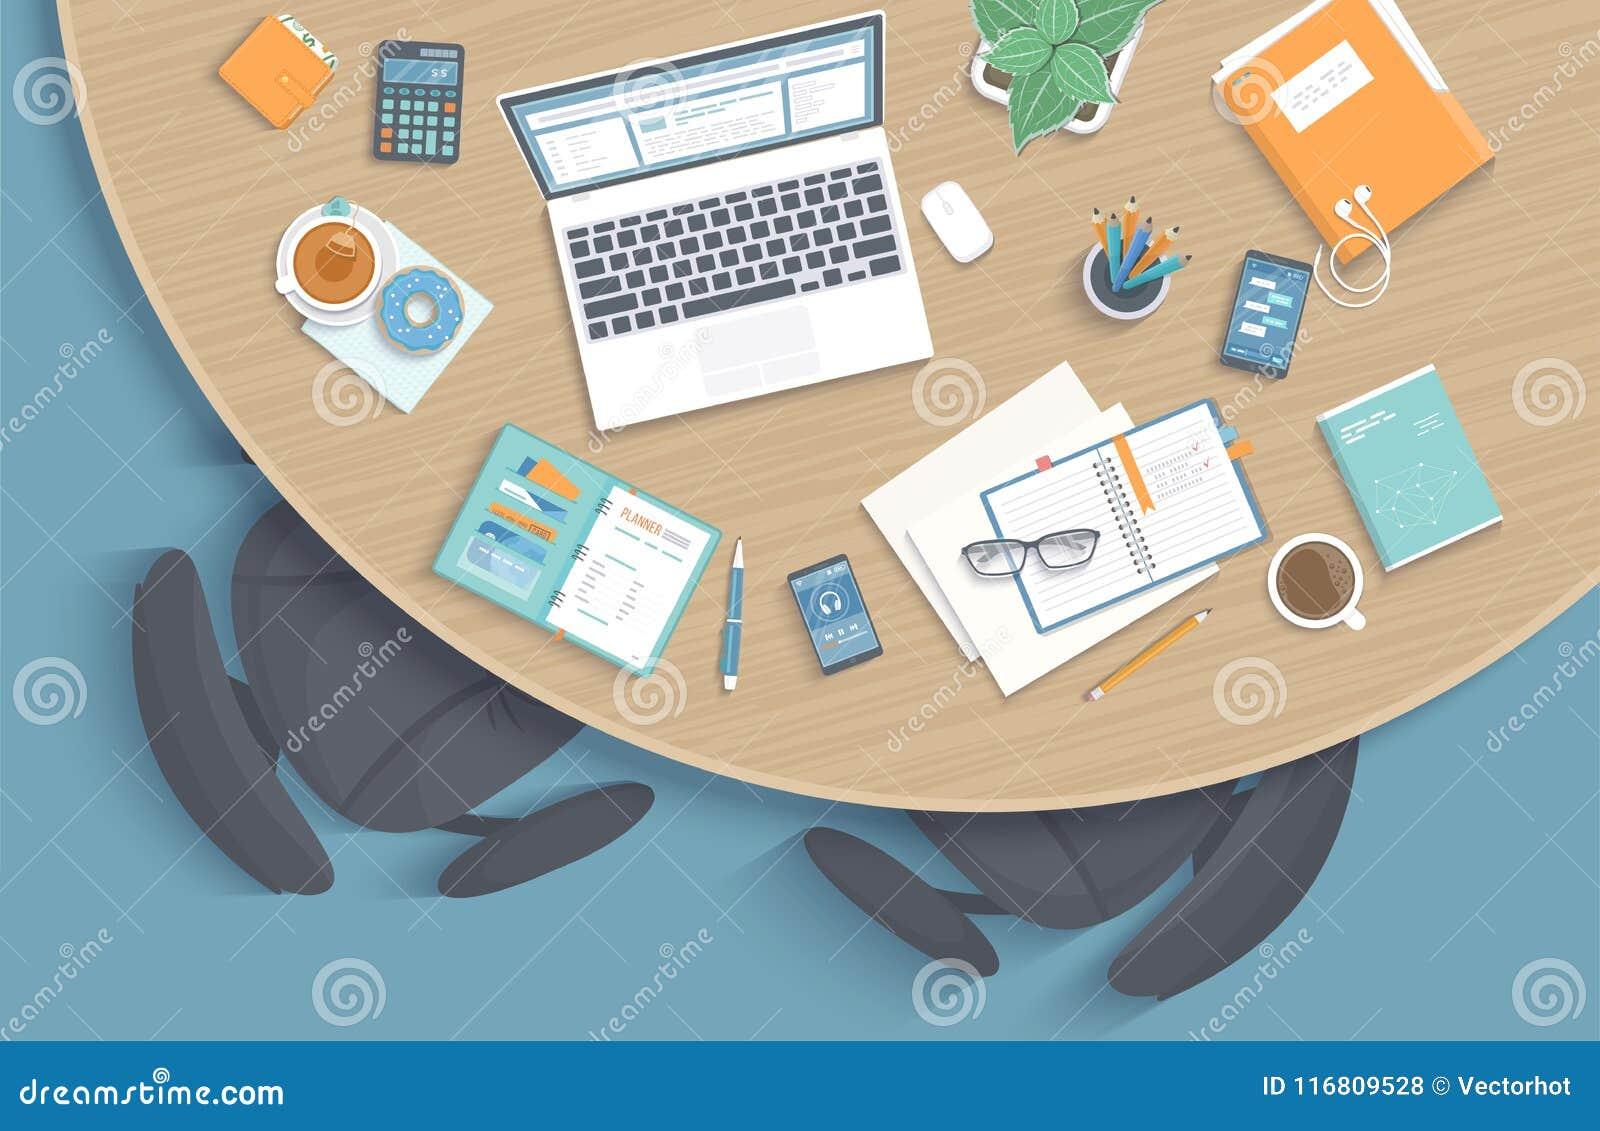 Hoogste mening van modern modieus rond houten bureau in bureau, stoelen, bureaulevering, laptop, omslag